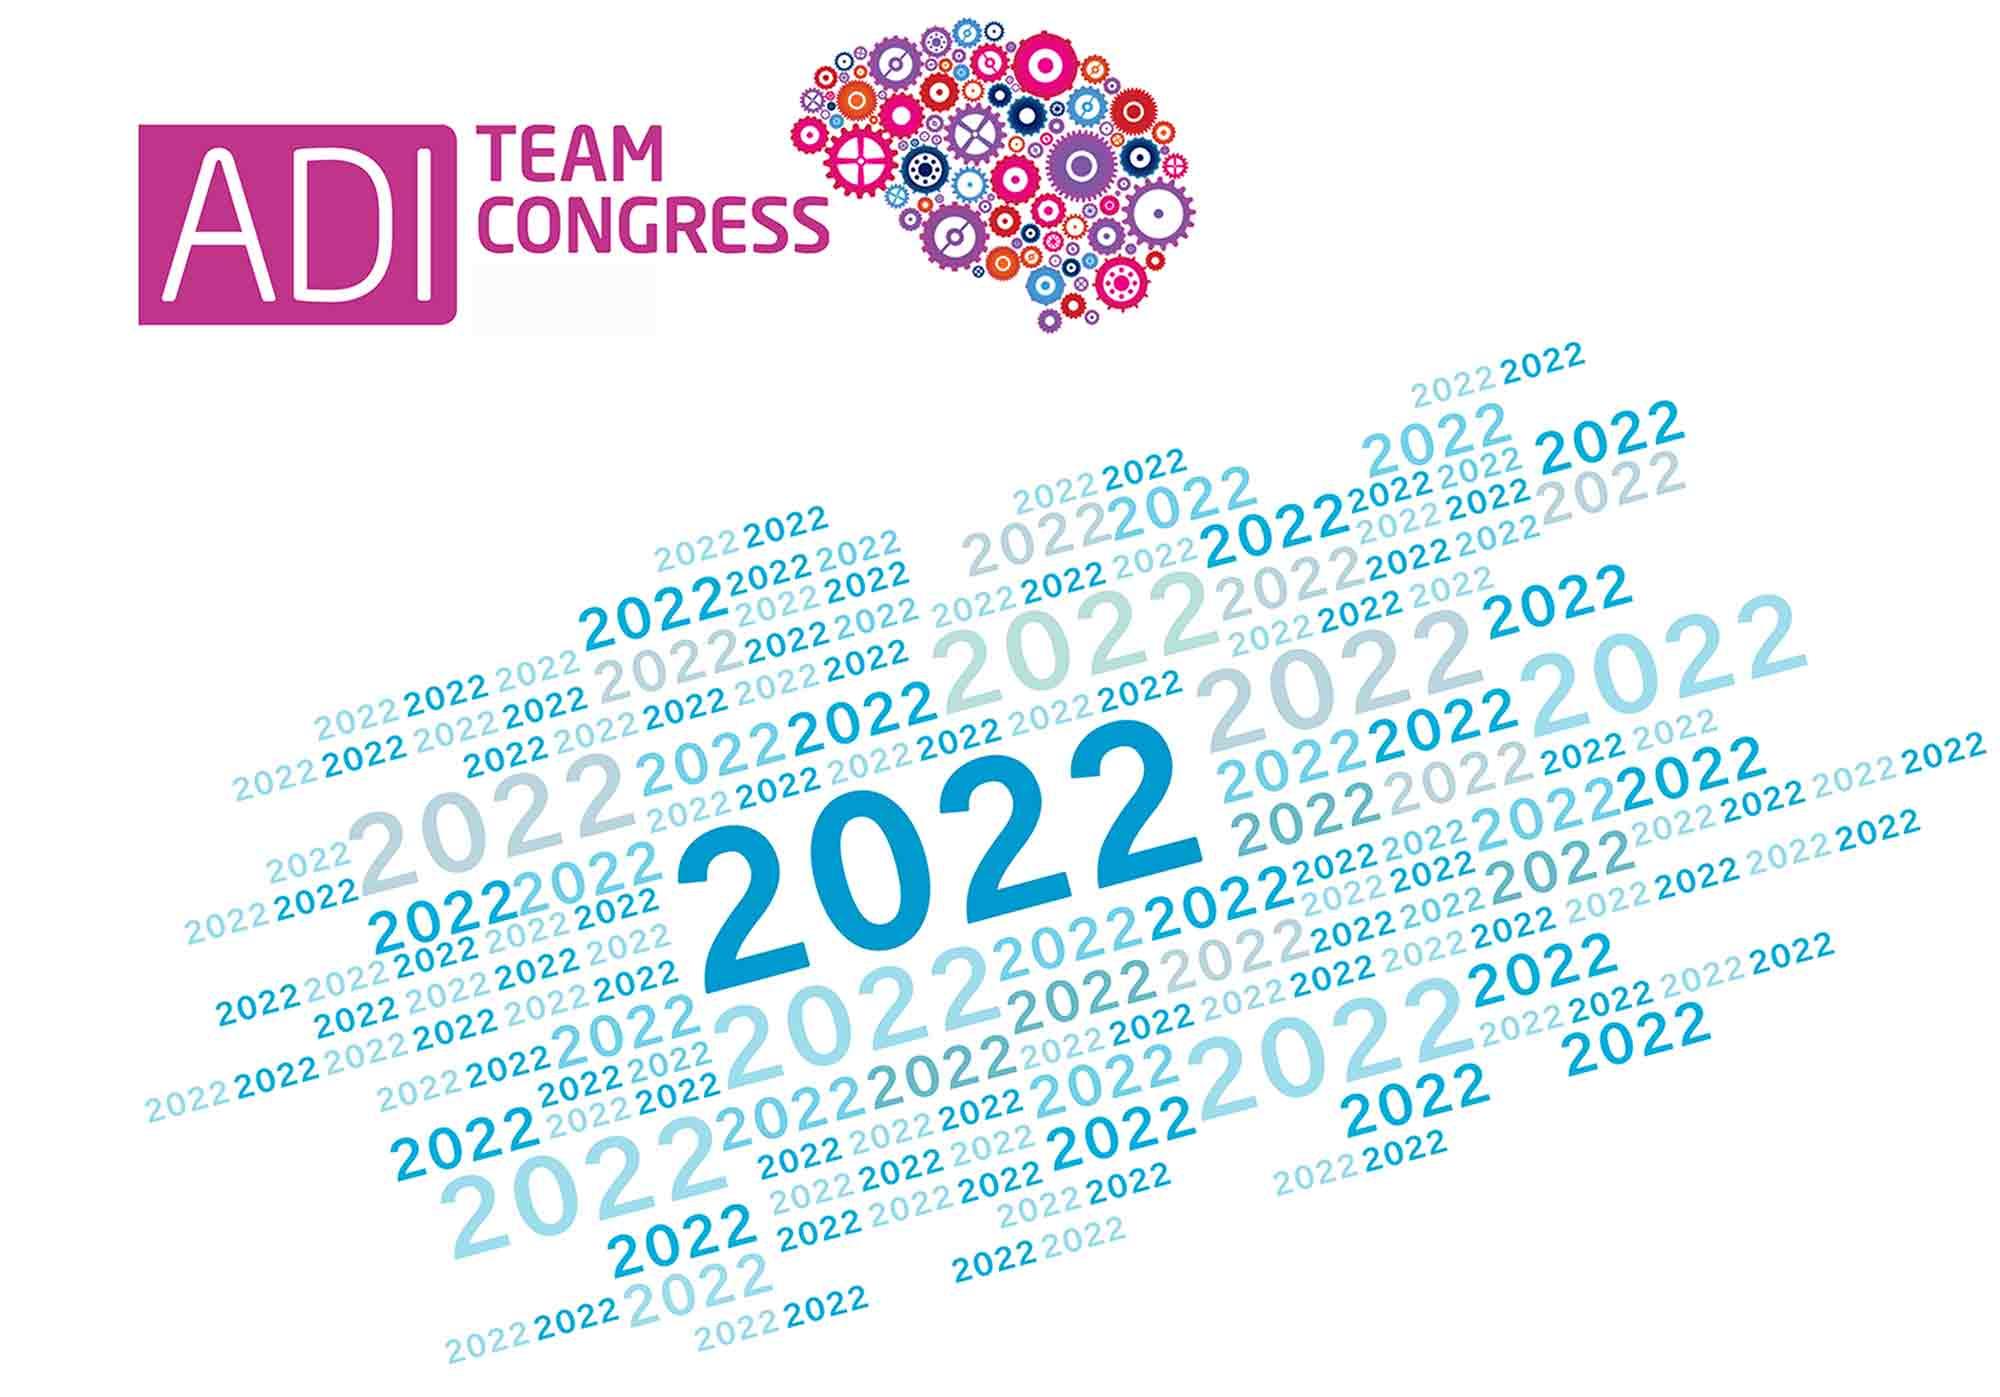 ADI Team Congress